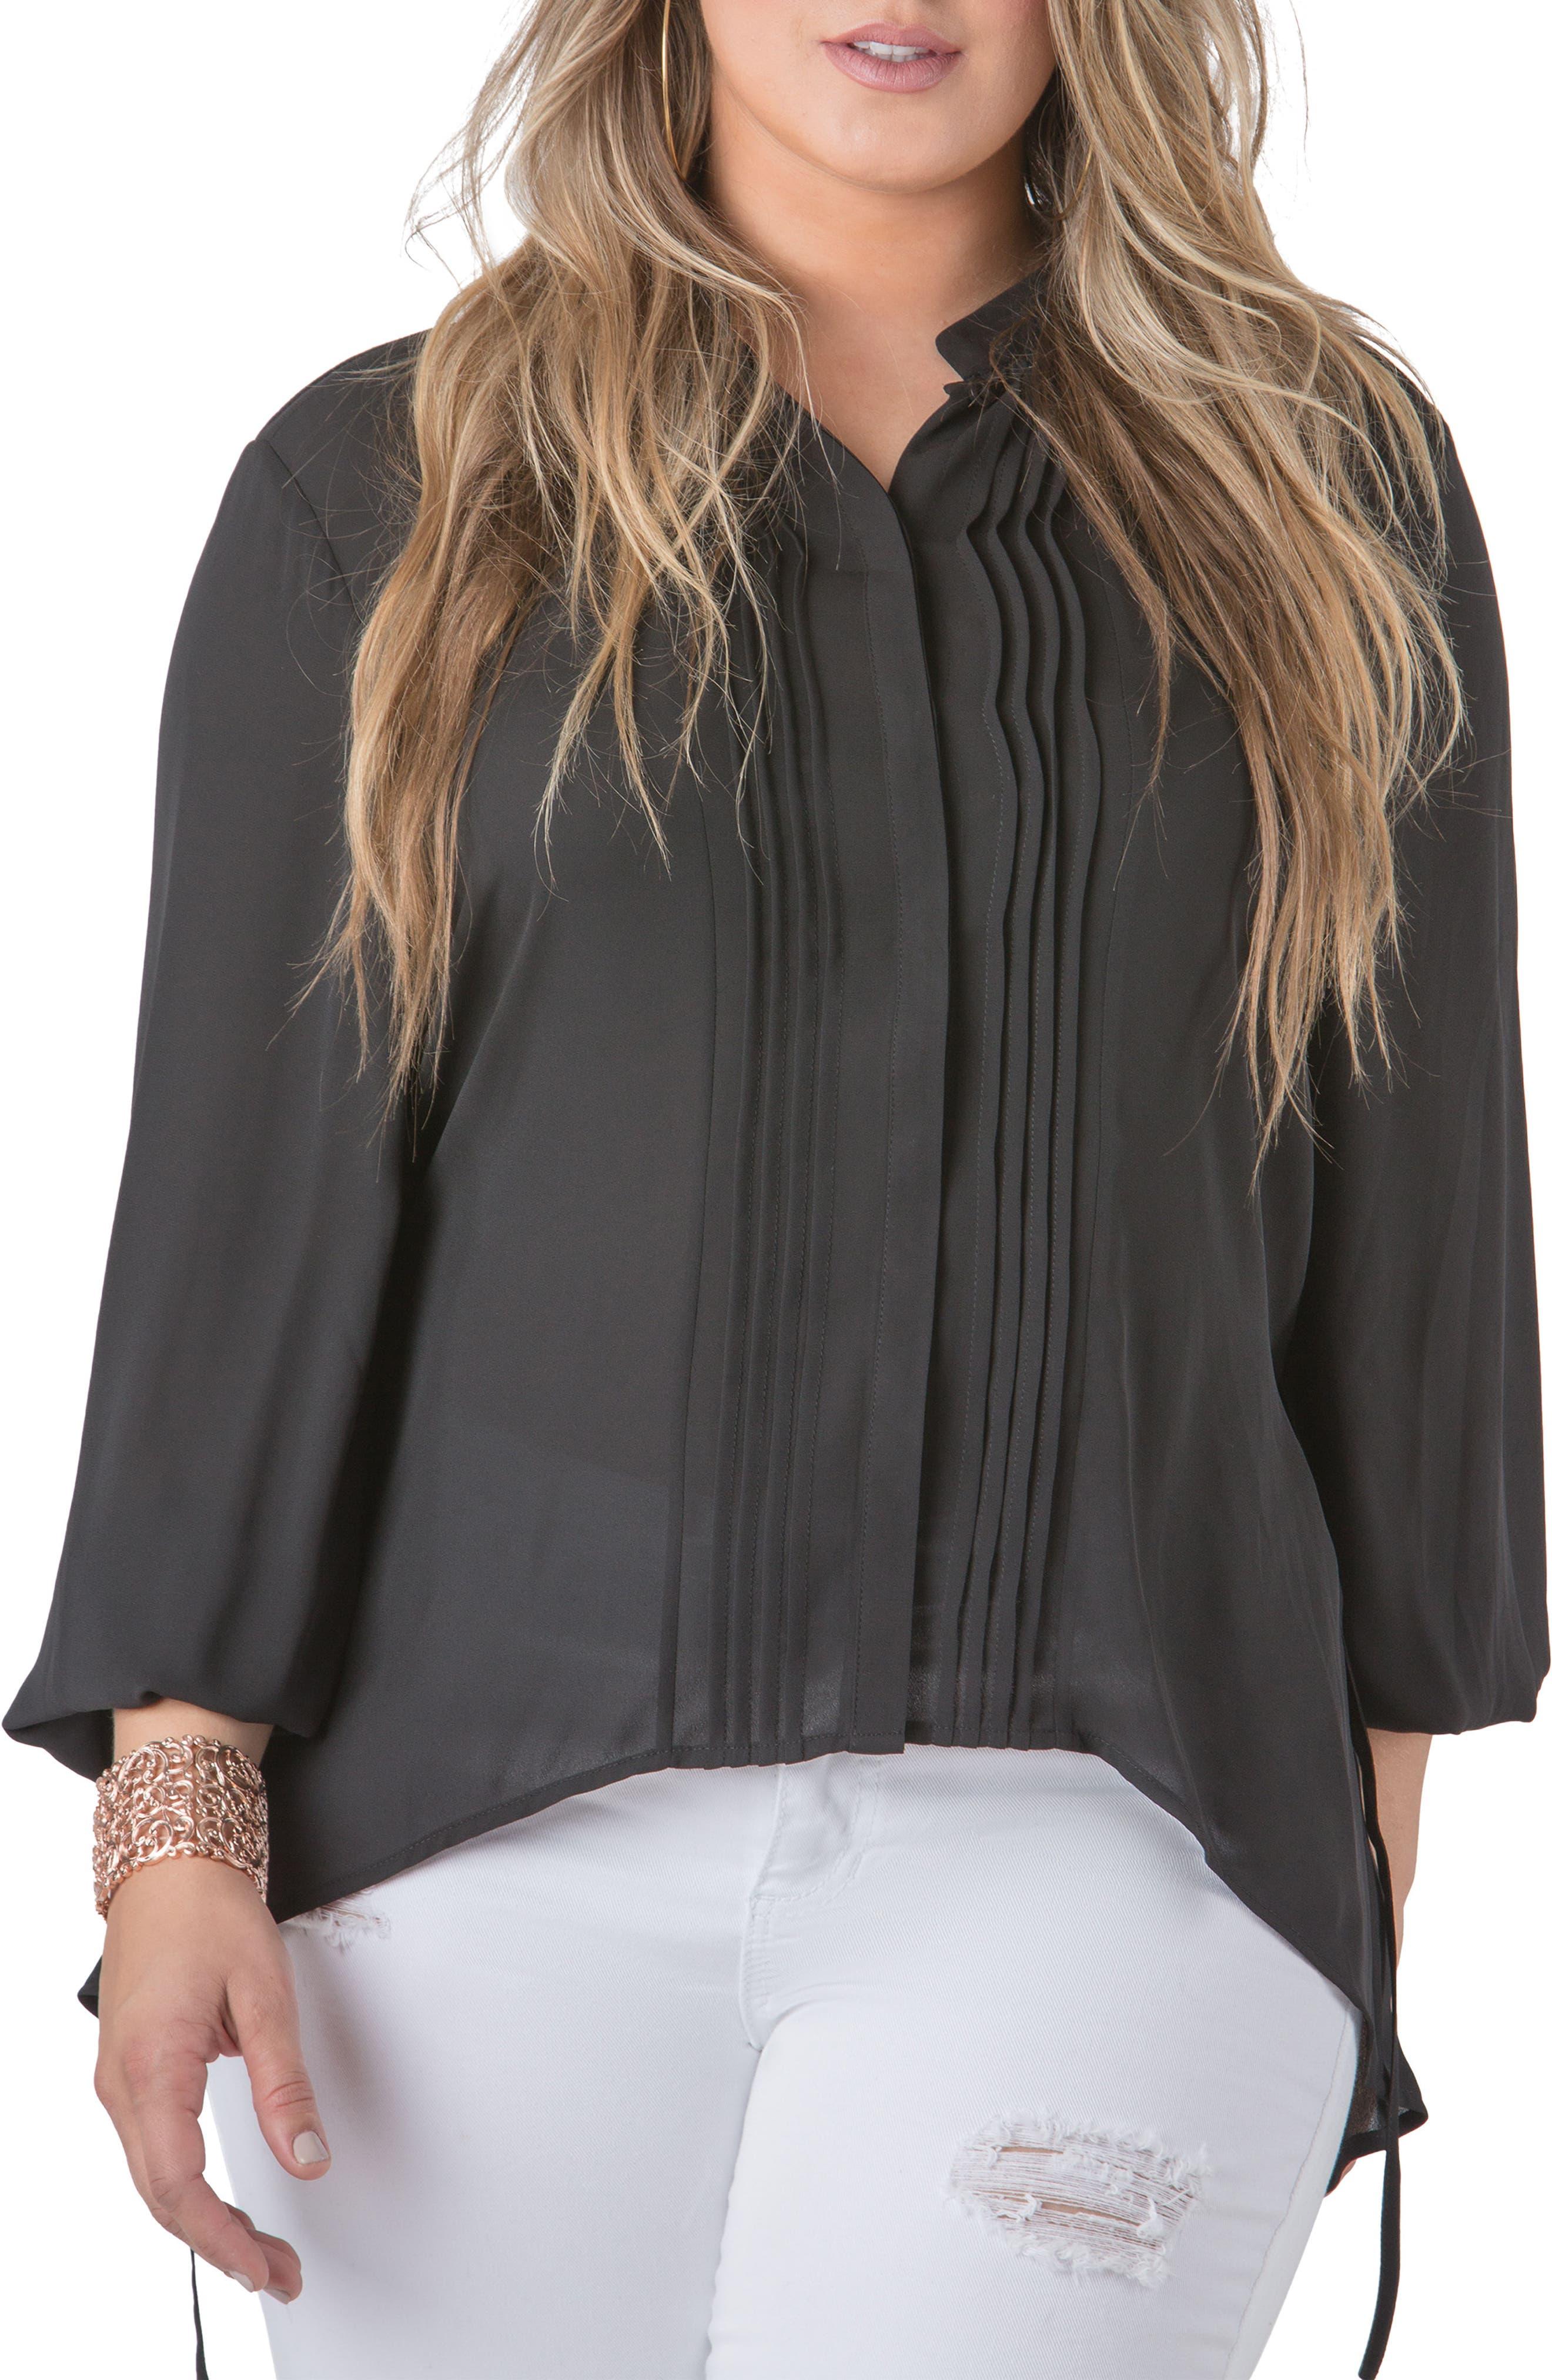 STANDARDS & PRACTICES, Trisha Tuxedo Front Chiffon Blouse, Main thumbnail 1, color, BLACK